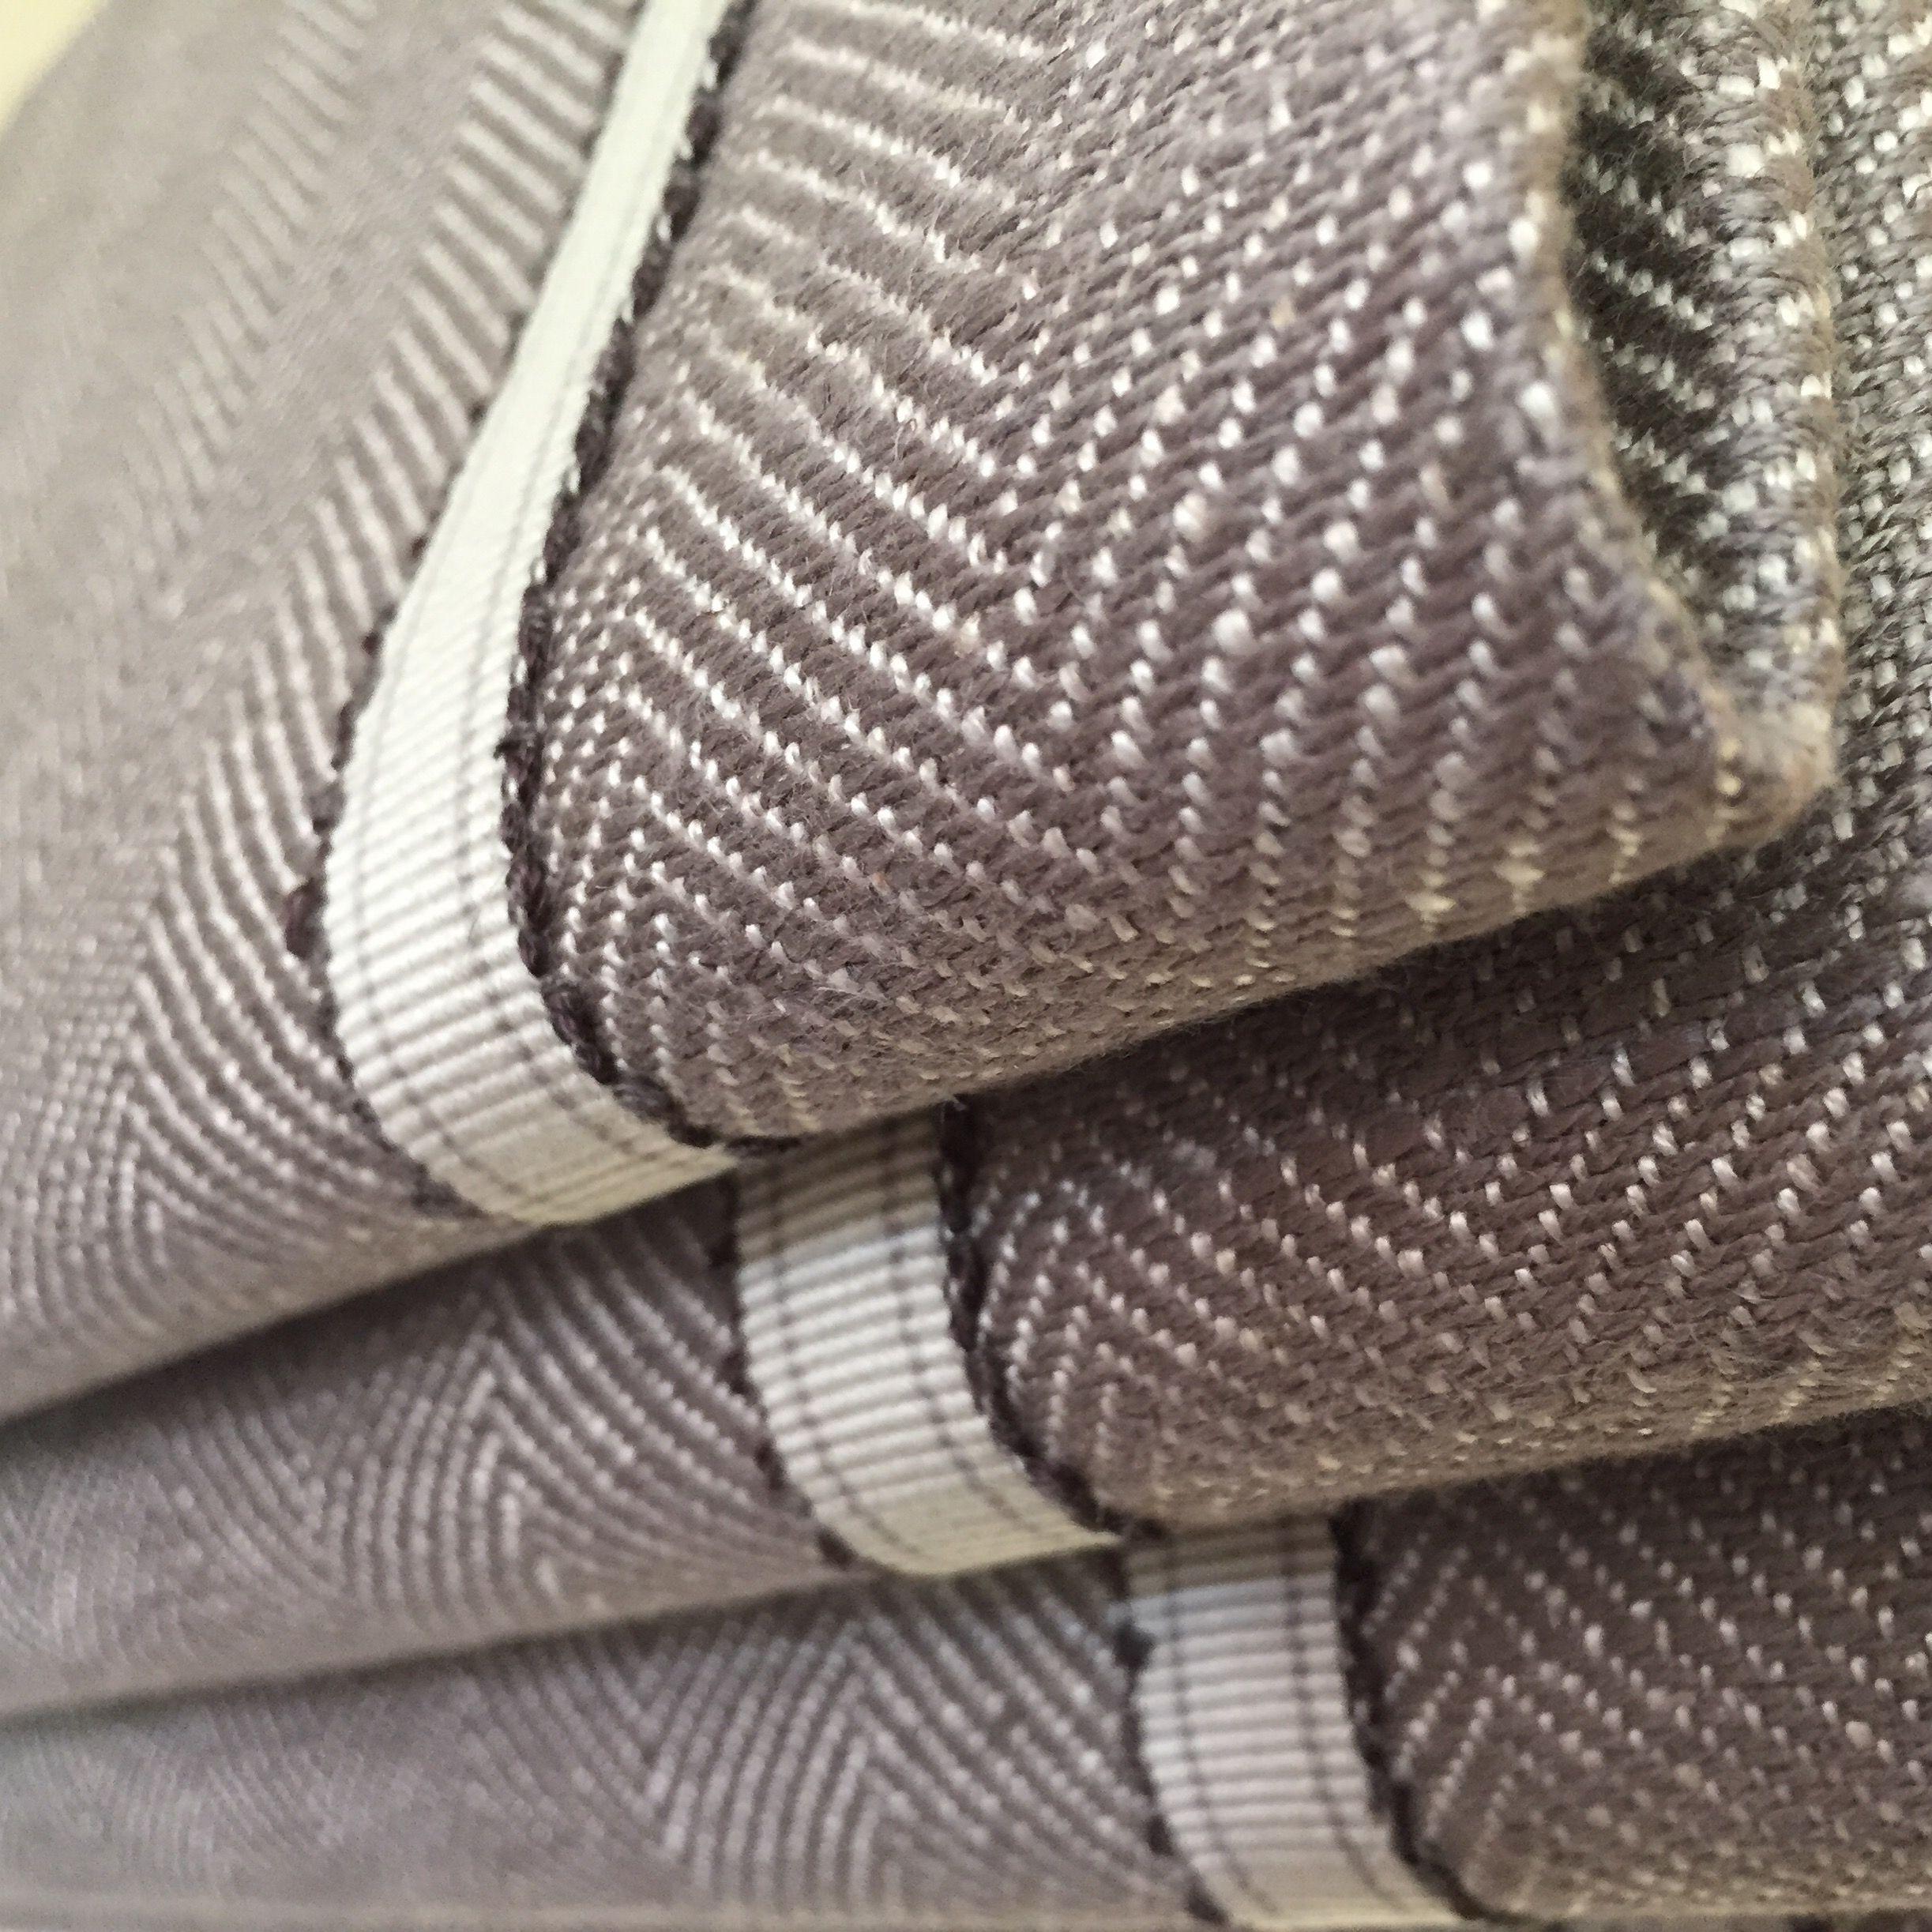 Ian Mankin Fabric With Braid Trim Roman Blind Handmade By